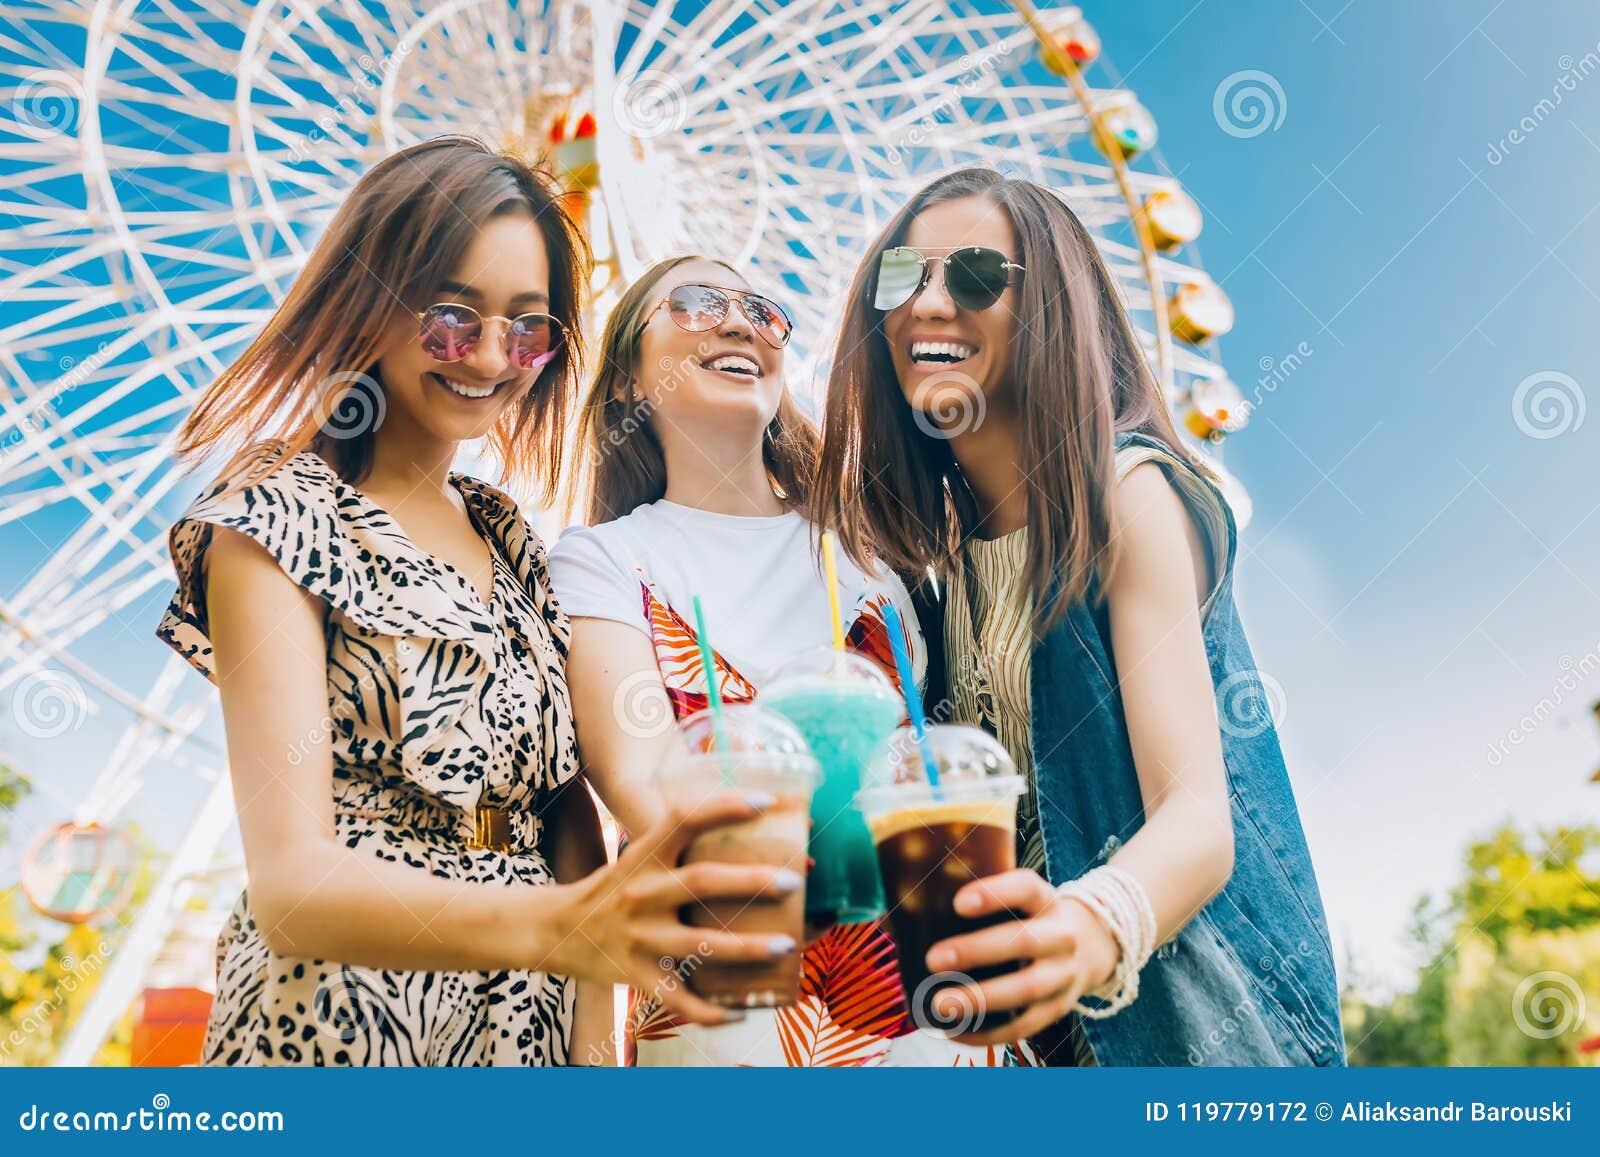 Summer lifestyle portrait multiracial women enjoy nice day, holding glasses of milkshakes. Happy friends inin front of